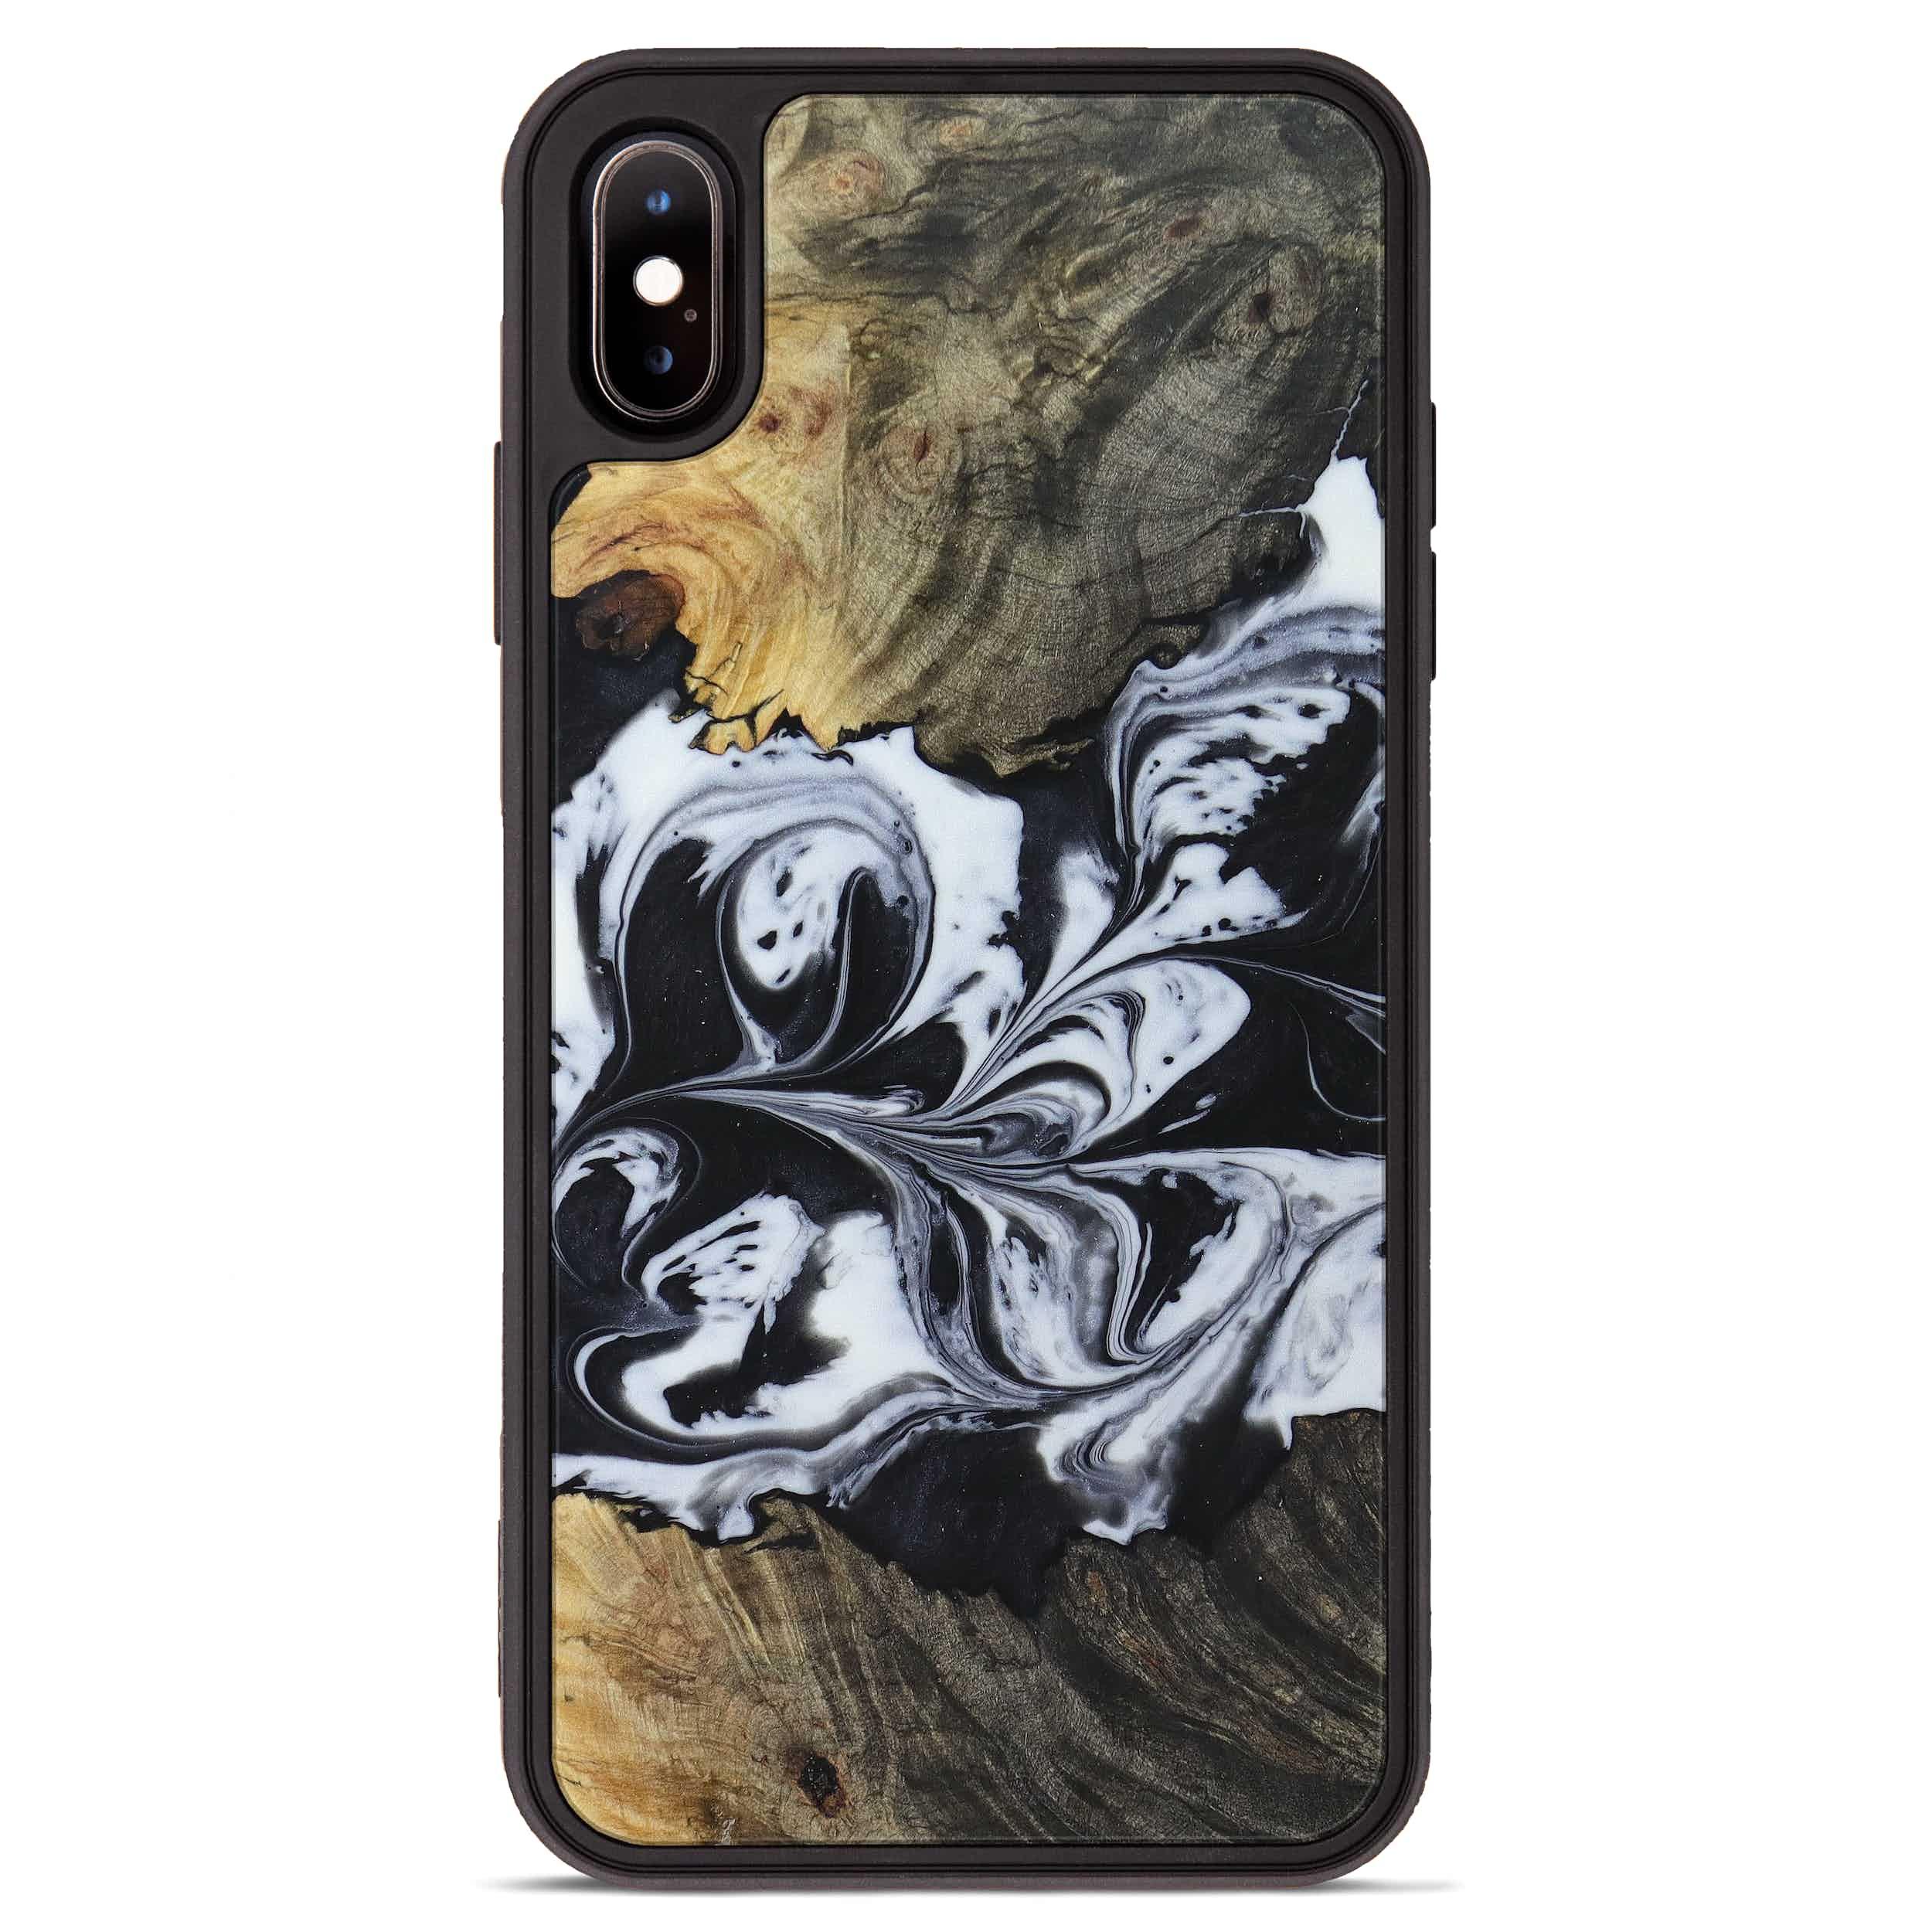 iPhone Xs Max Wood+Resin Phone Case - Monica (Black & White, 397361)